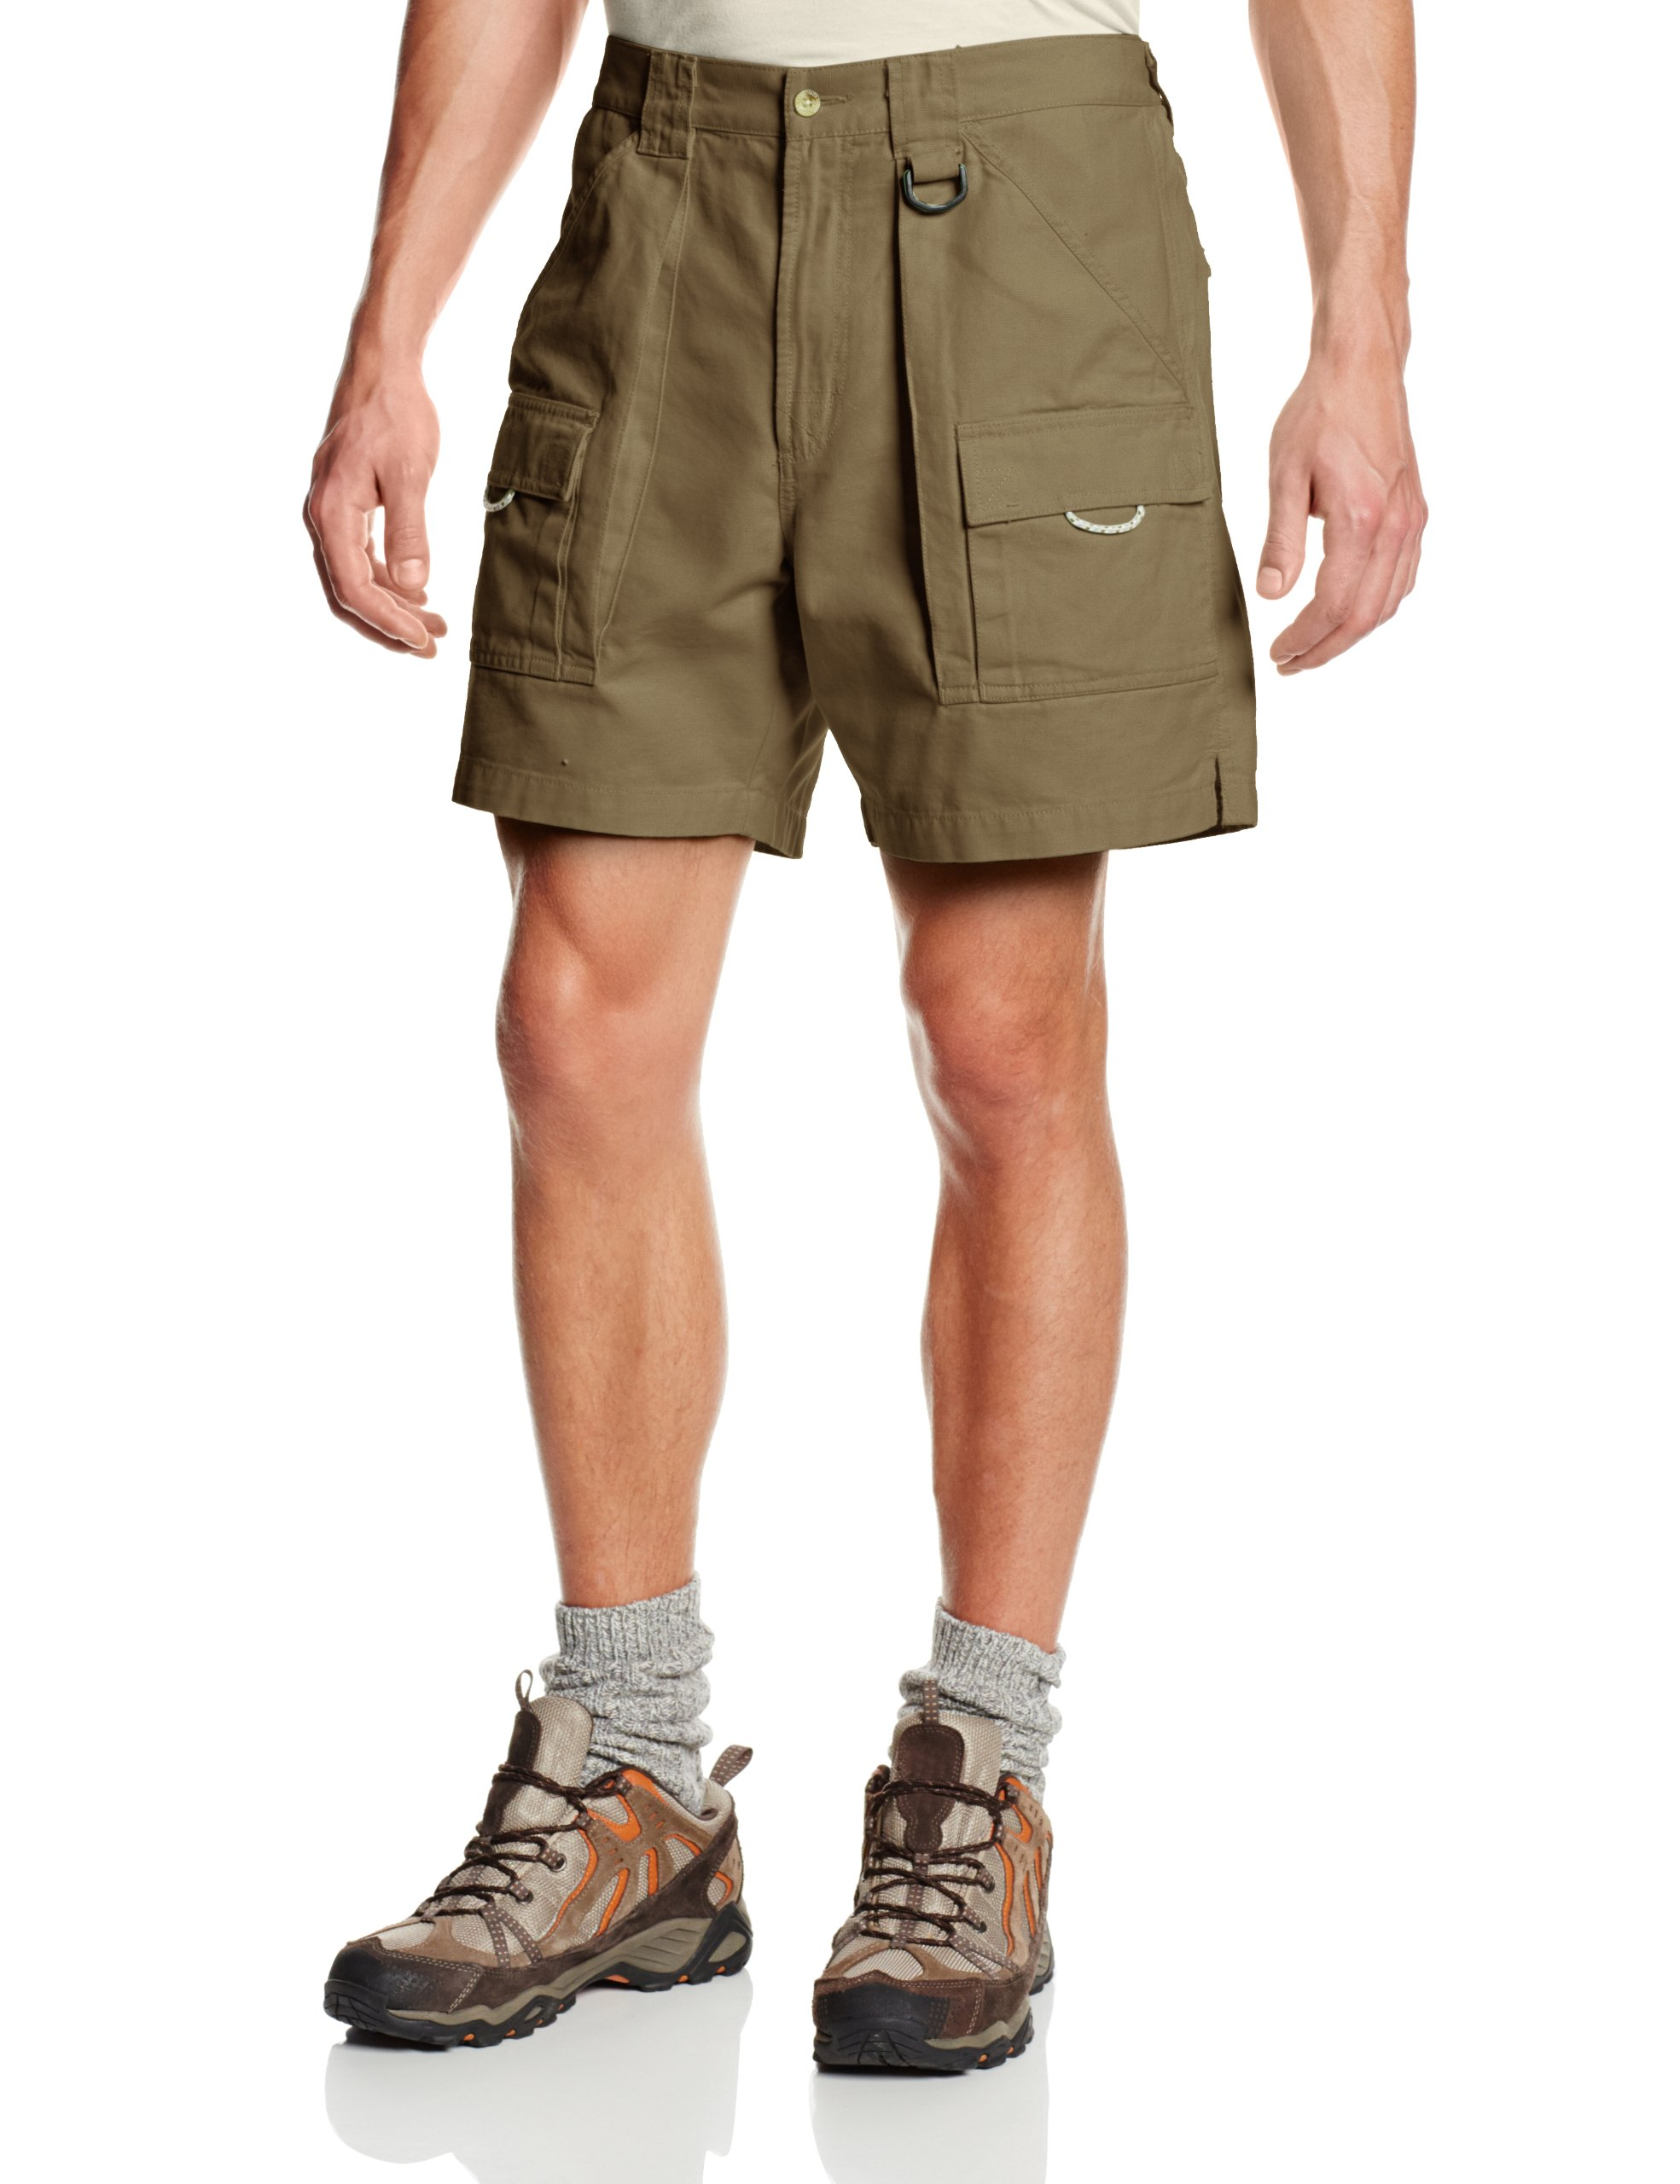 Columbia Men's Brewha II Shorts, Sage, X-Large